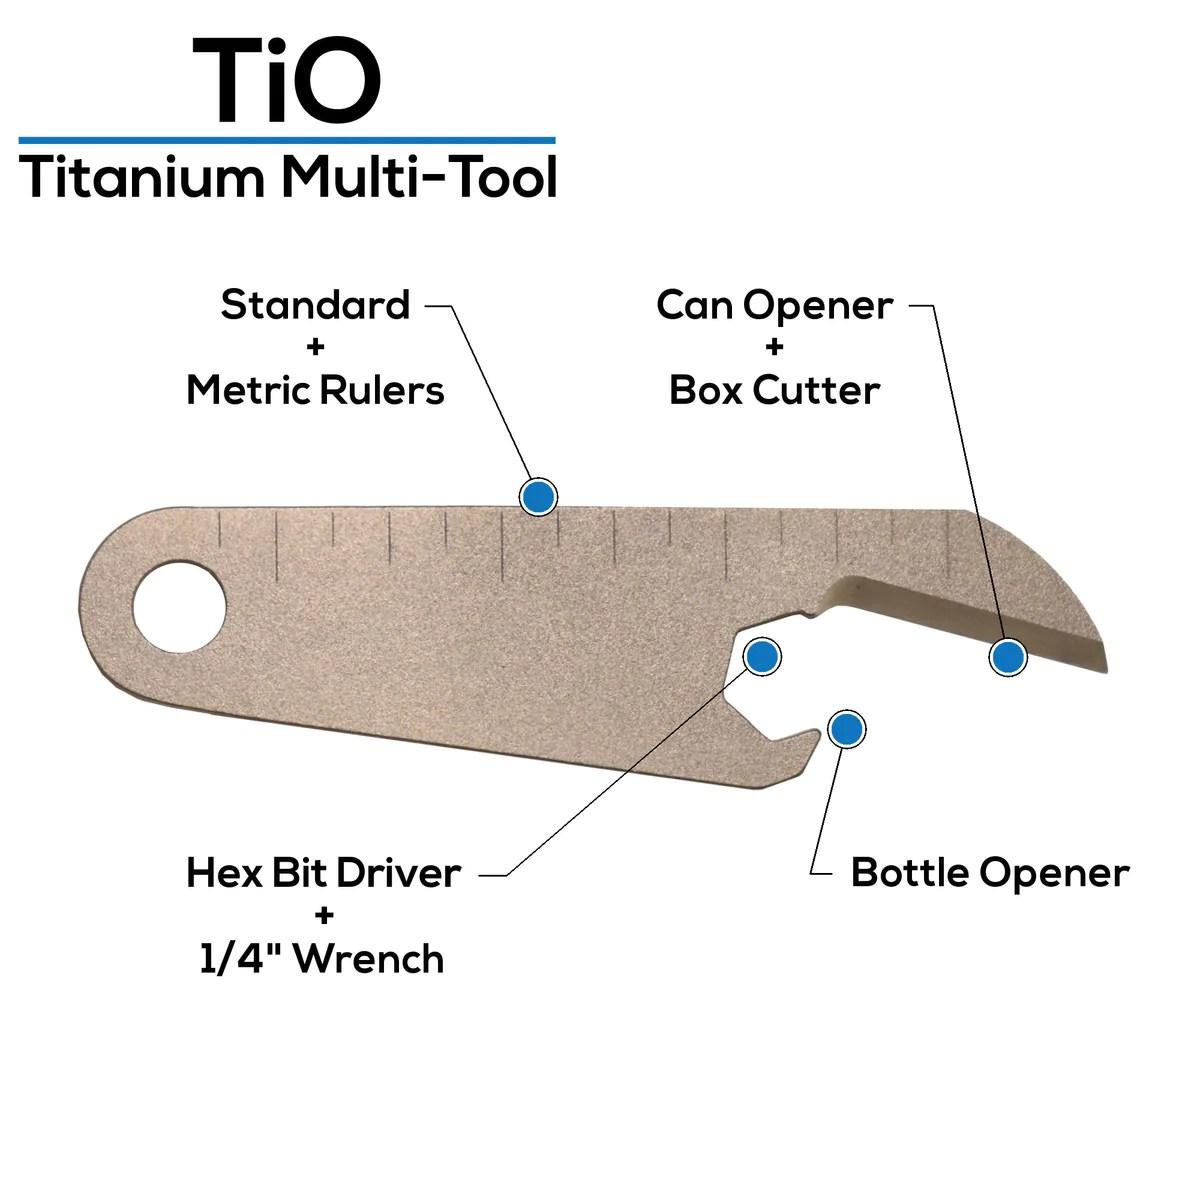 small resolution of  washing bottle opener diagram wiring diagram on clothes dryer schematic toaster schematic washing machine